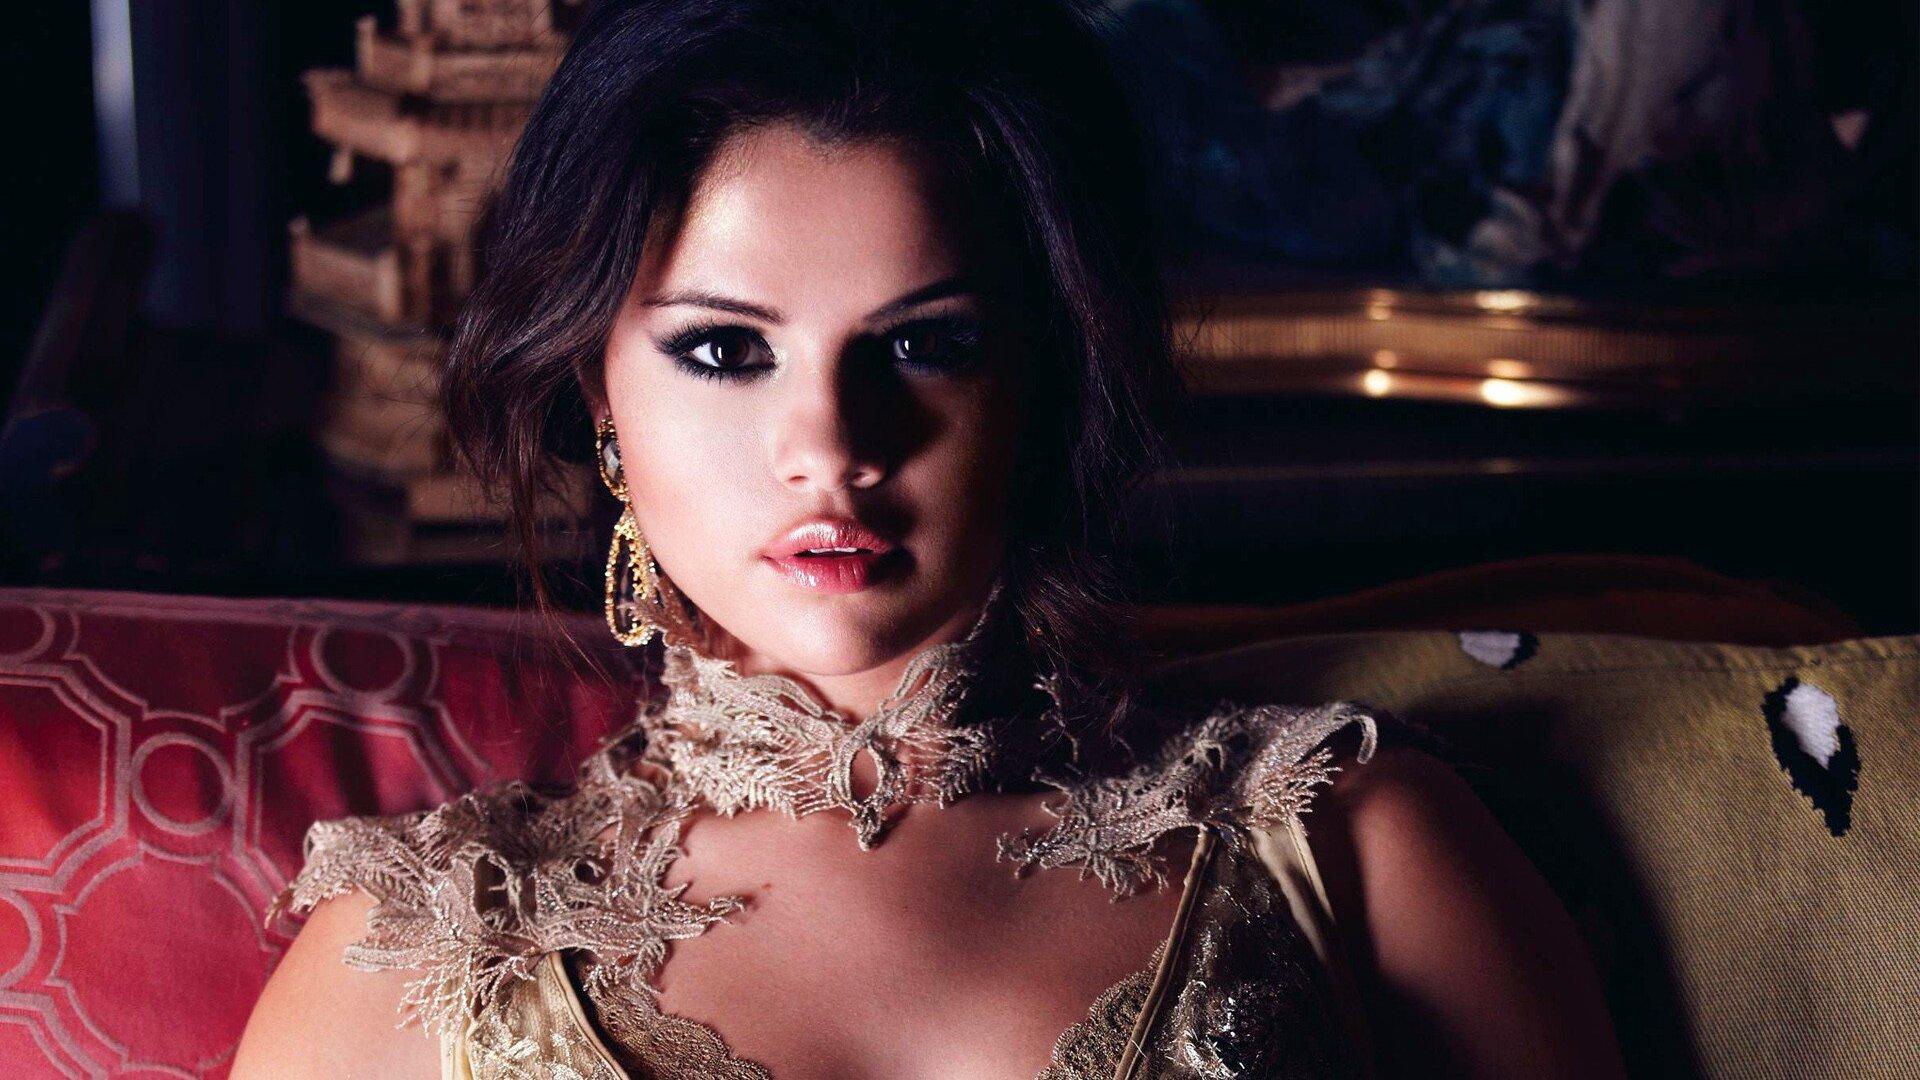 1920x1080 Selena Gomez Hd Laptop Full Hd 1080p Hd 4k Wallpapers